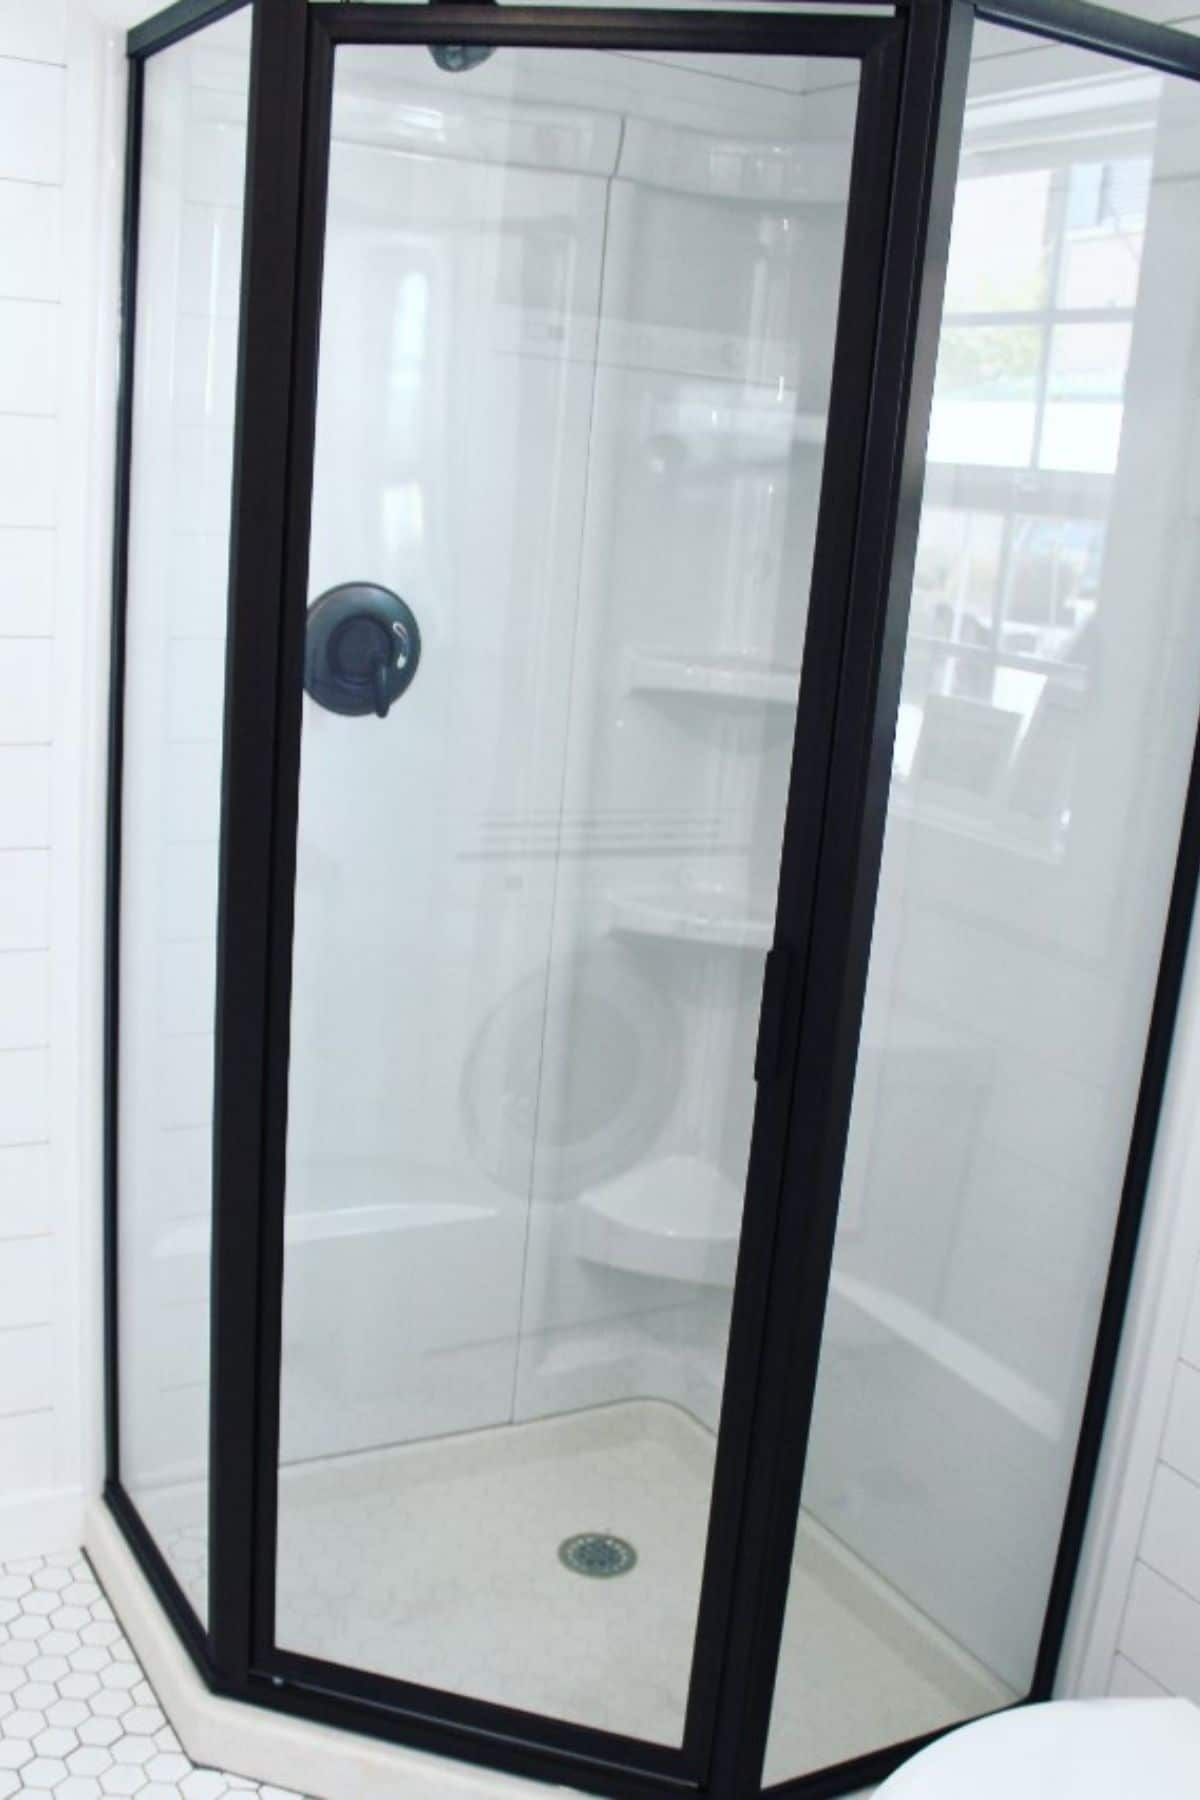 Glass shower stall with black trim